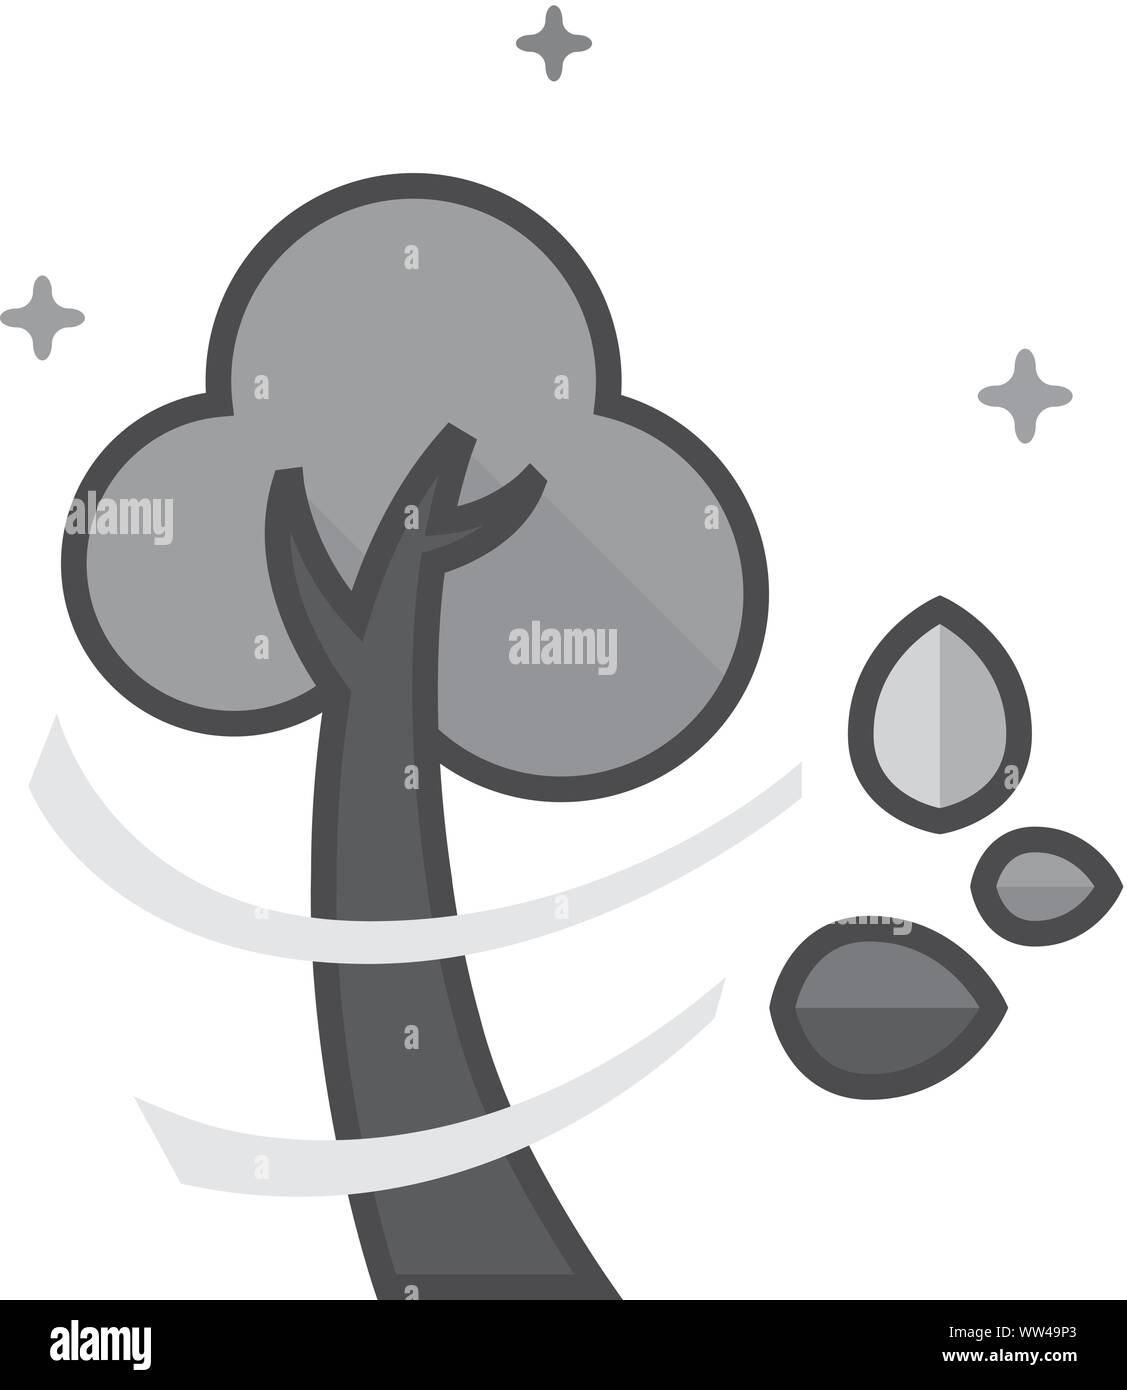 Baum Symbol in flachen Umrissen Graustufen Stil. Vector Illustration. Stock Vektor